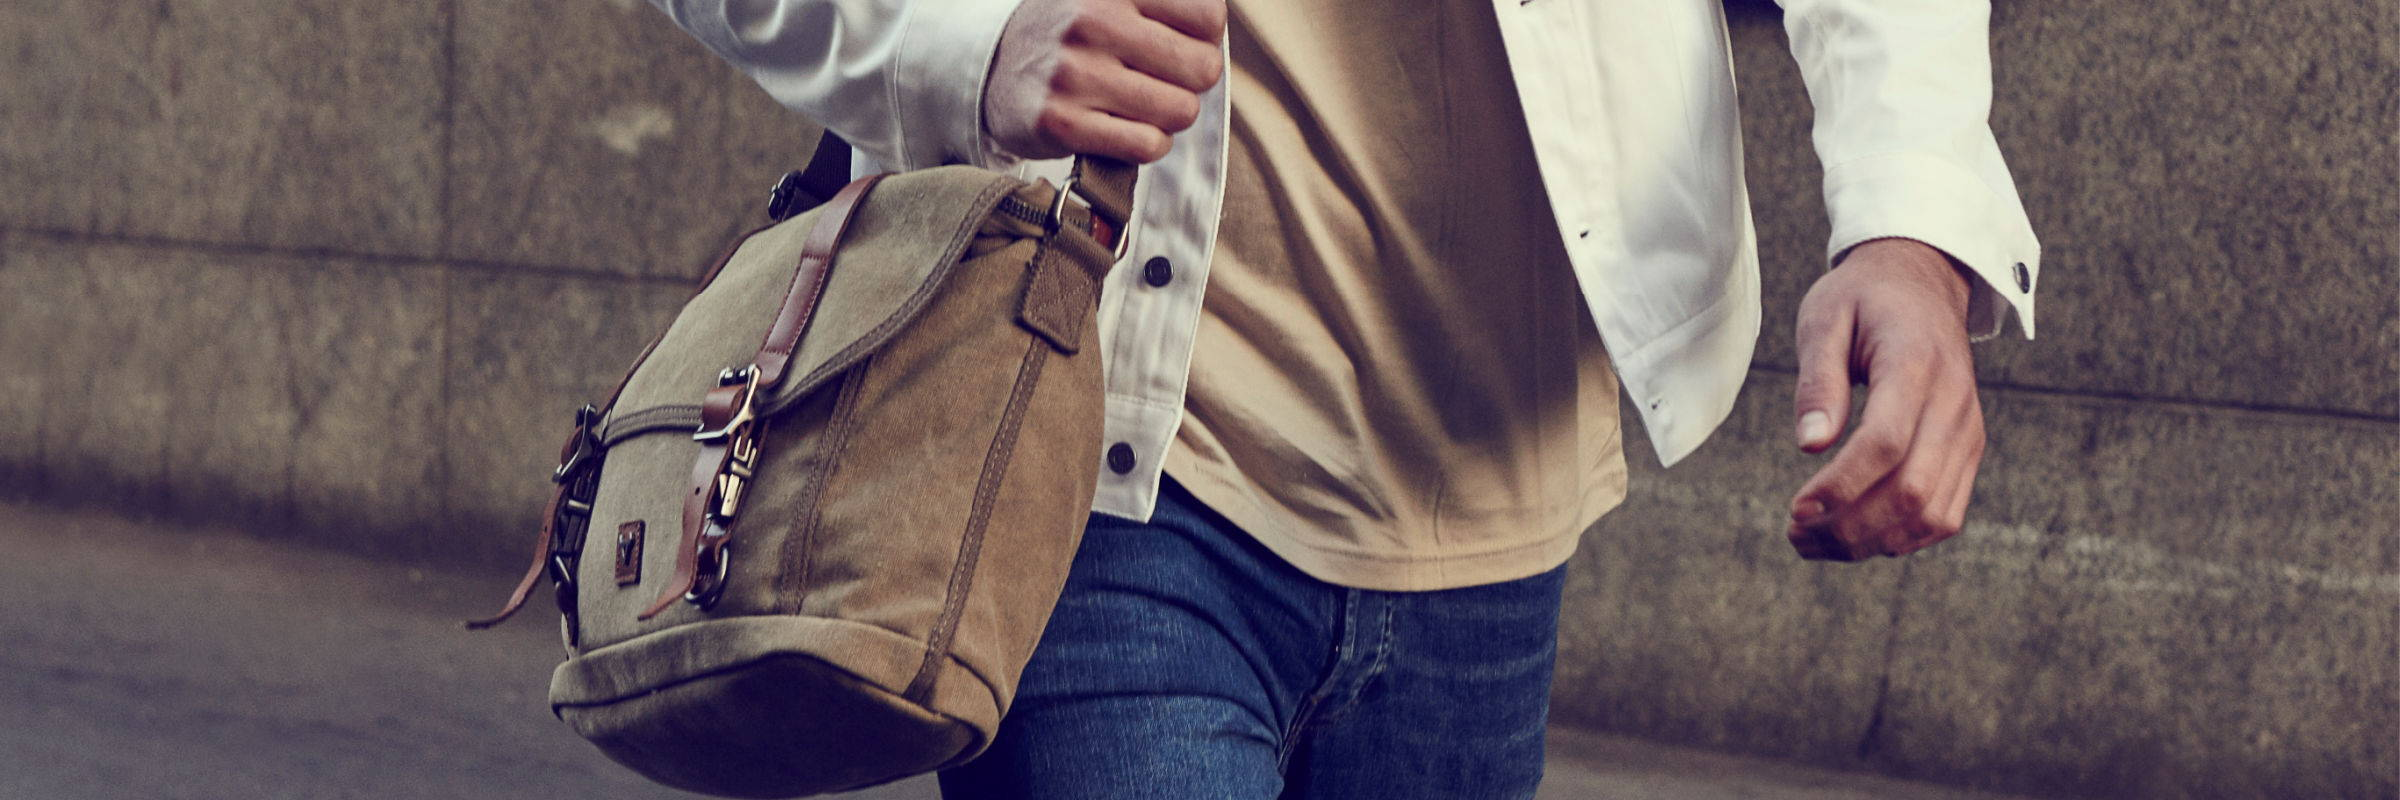 MEN'S LEATHER CROSSBODY BAGS